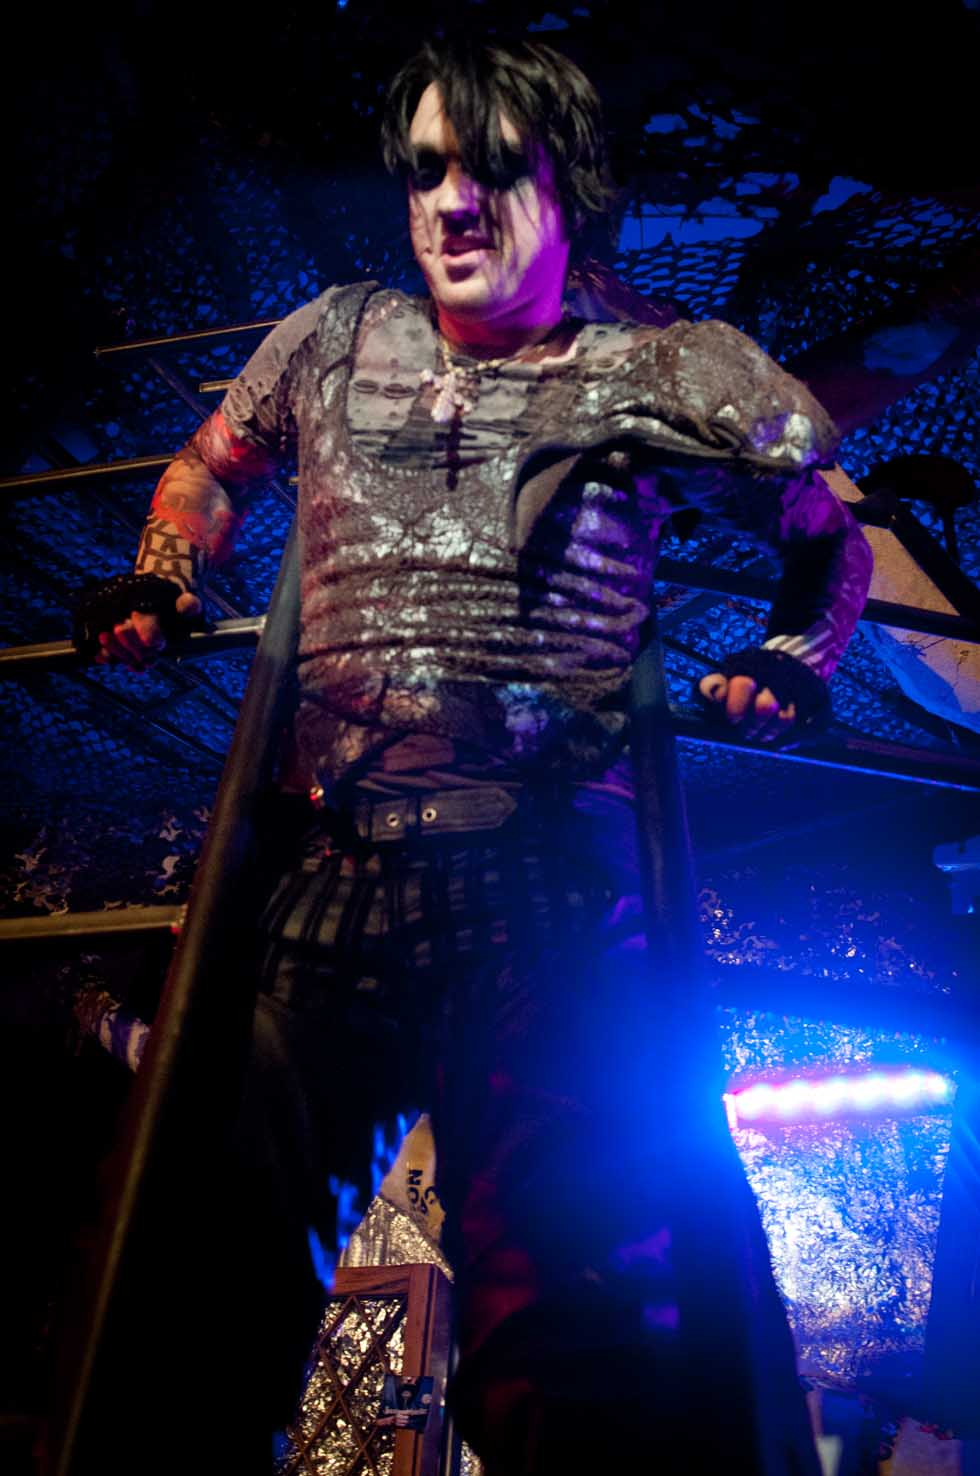 zum-schneider-nyc-2012-karneval-apocalyptika-4118.jpg